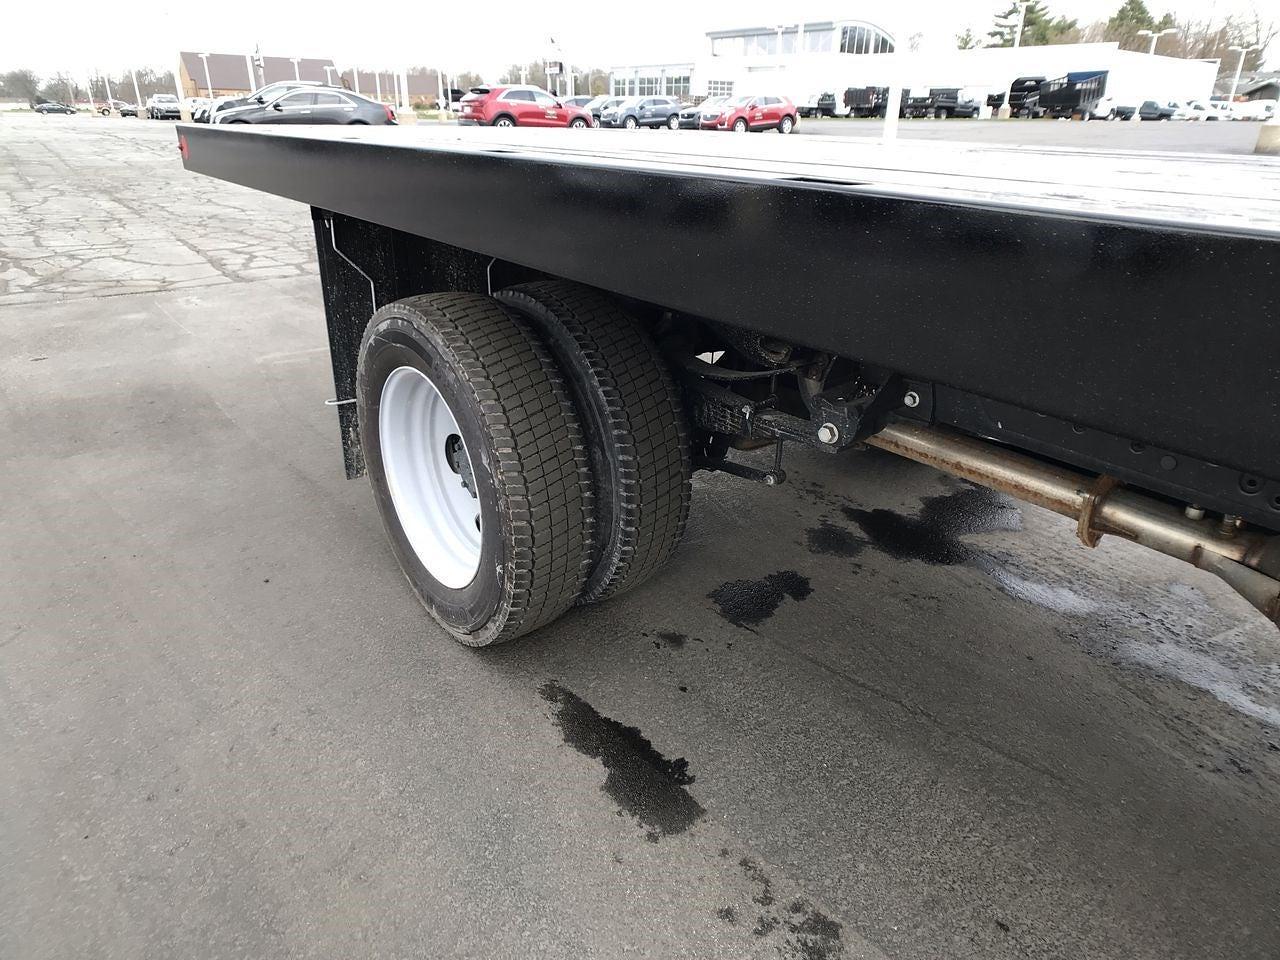 2019 Ford F-550 Regular Cab DRW 4x2, Platform Body #111643 - photo 10